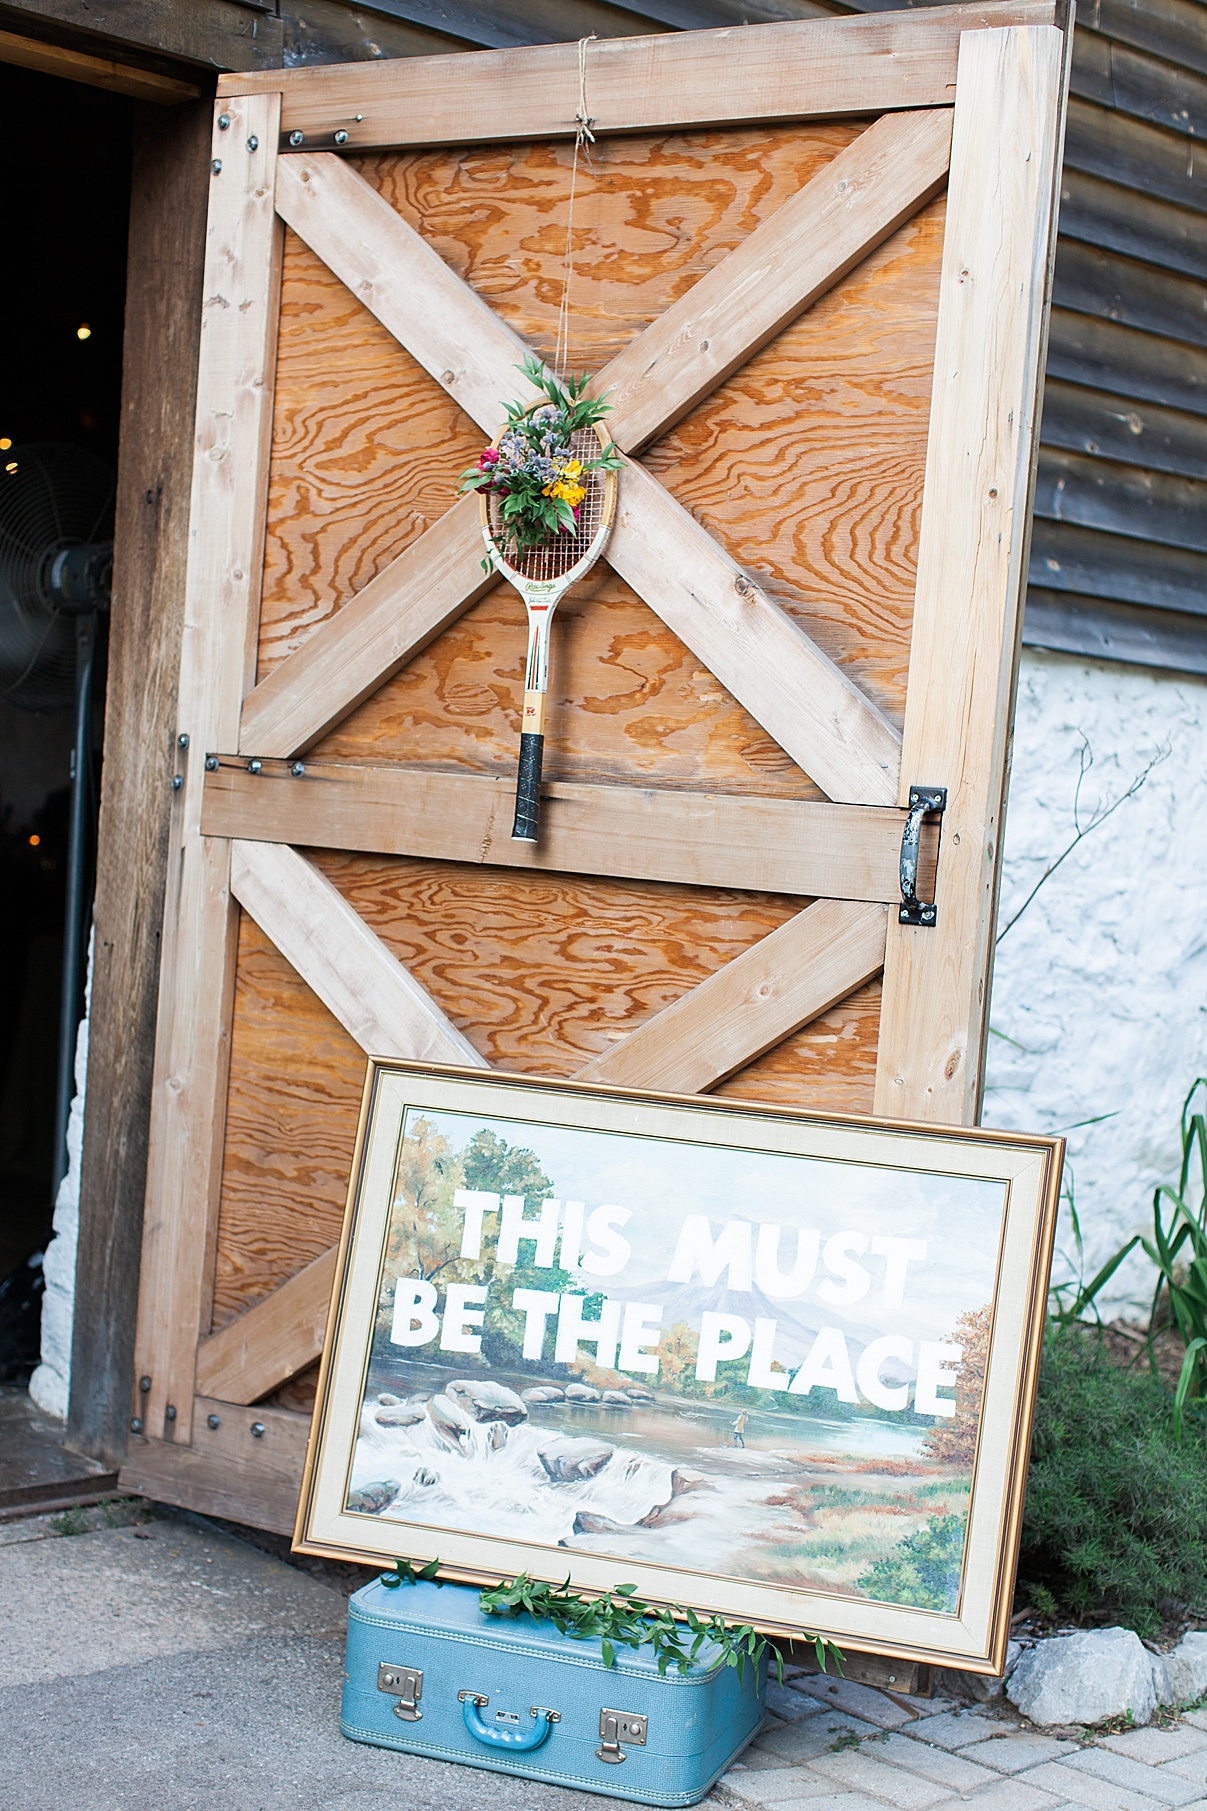 Barn door and sign for wedding reception | Balls Falls, Ontario Wedding| Ontario Wedding Photographer| Toronto Wedding Photographer| 3Photography| 3photography.ca